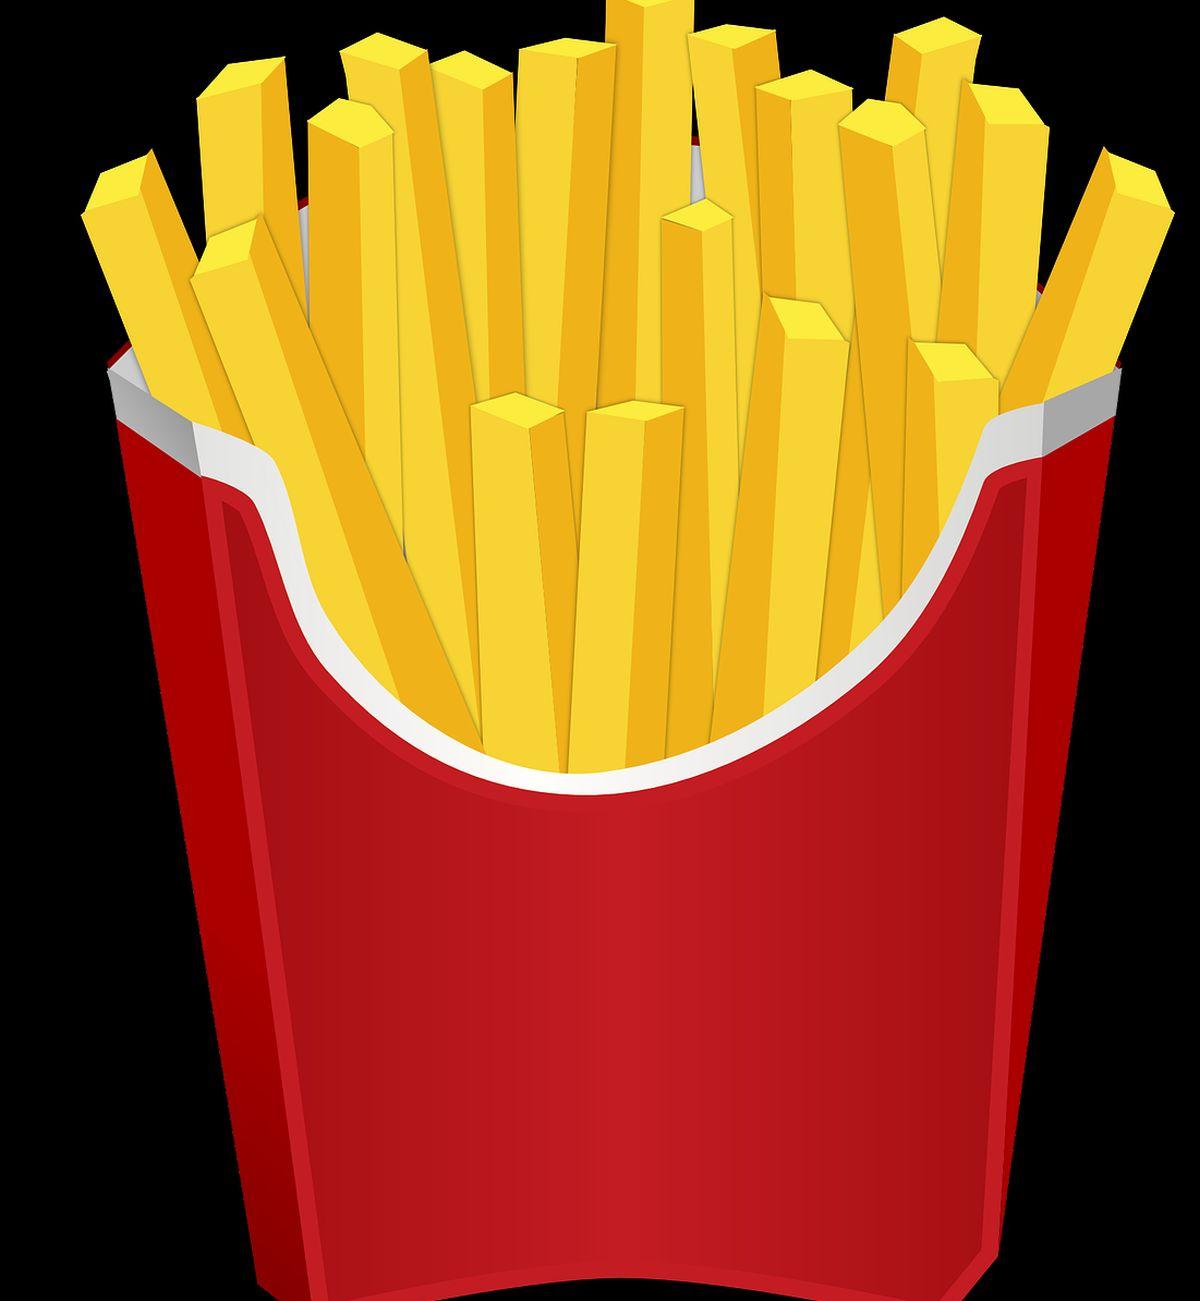 Studentica u francuskom McDonald'su umjesto krumpirića pojela puža